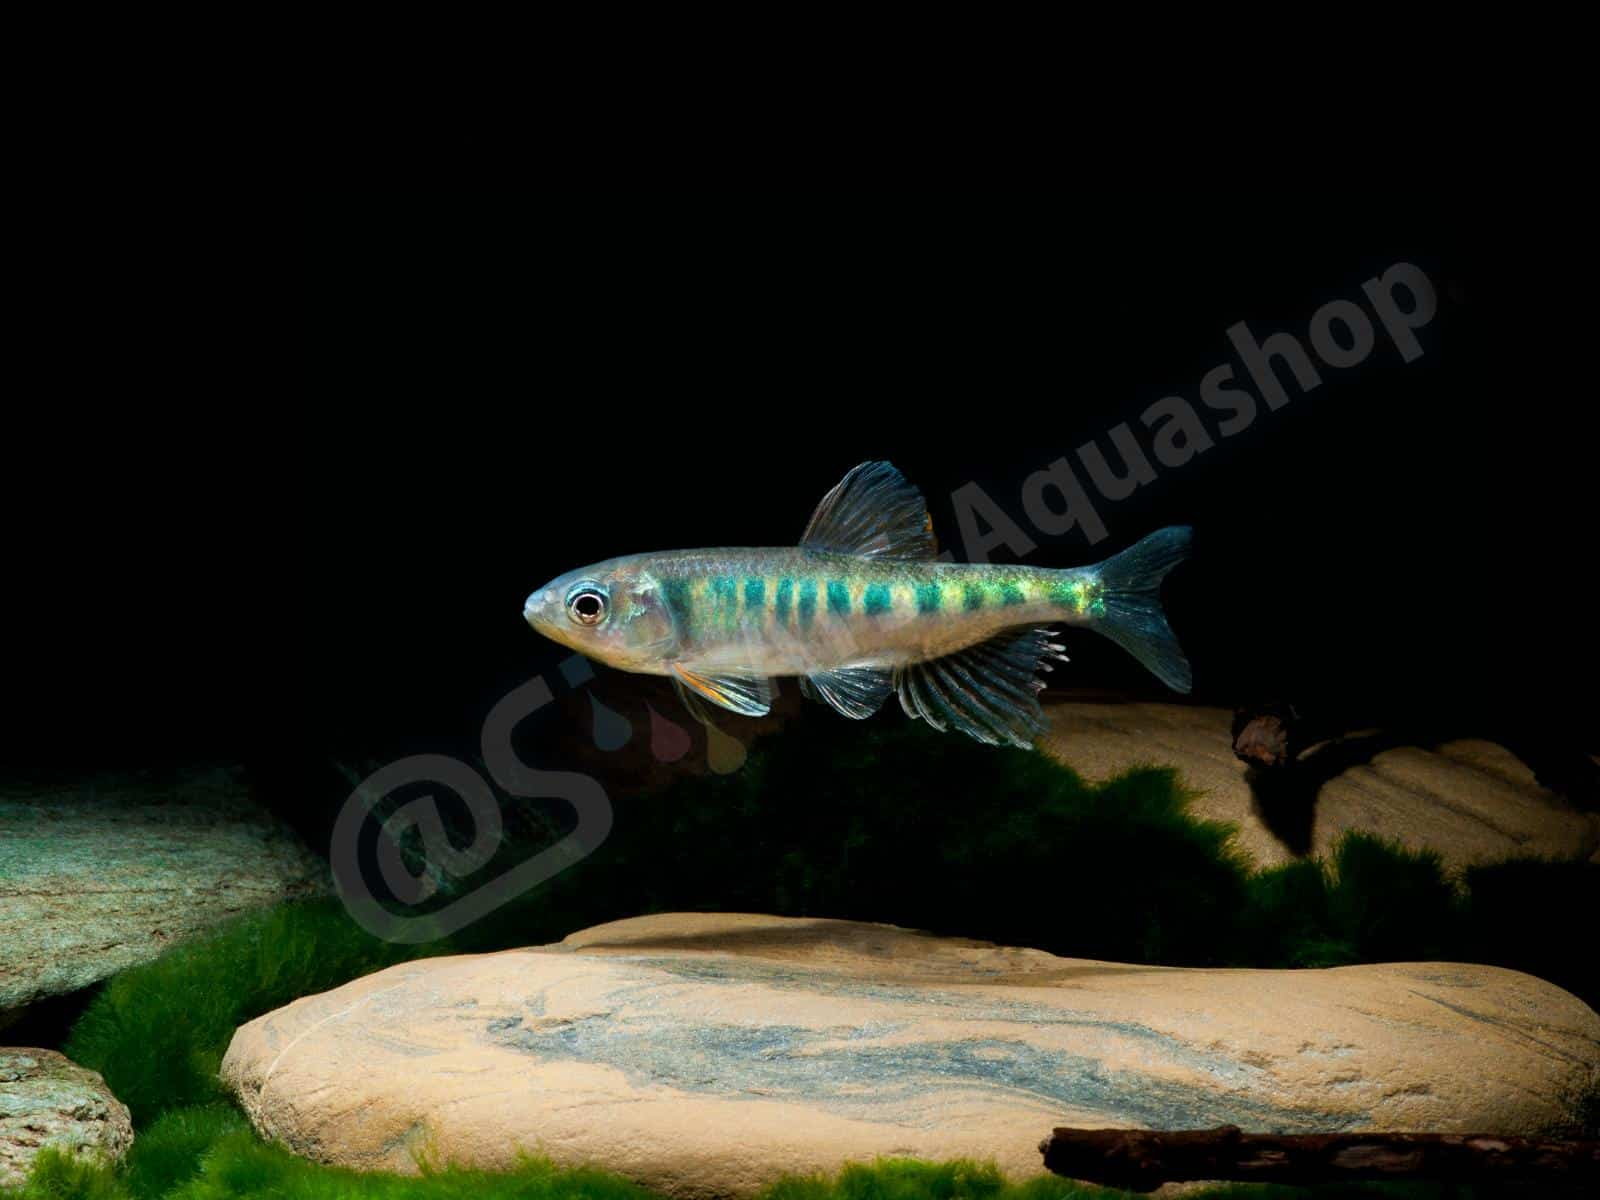 opsarius pulchellus enrico richter 0324 7